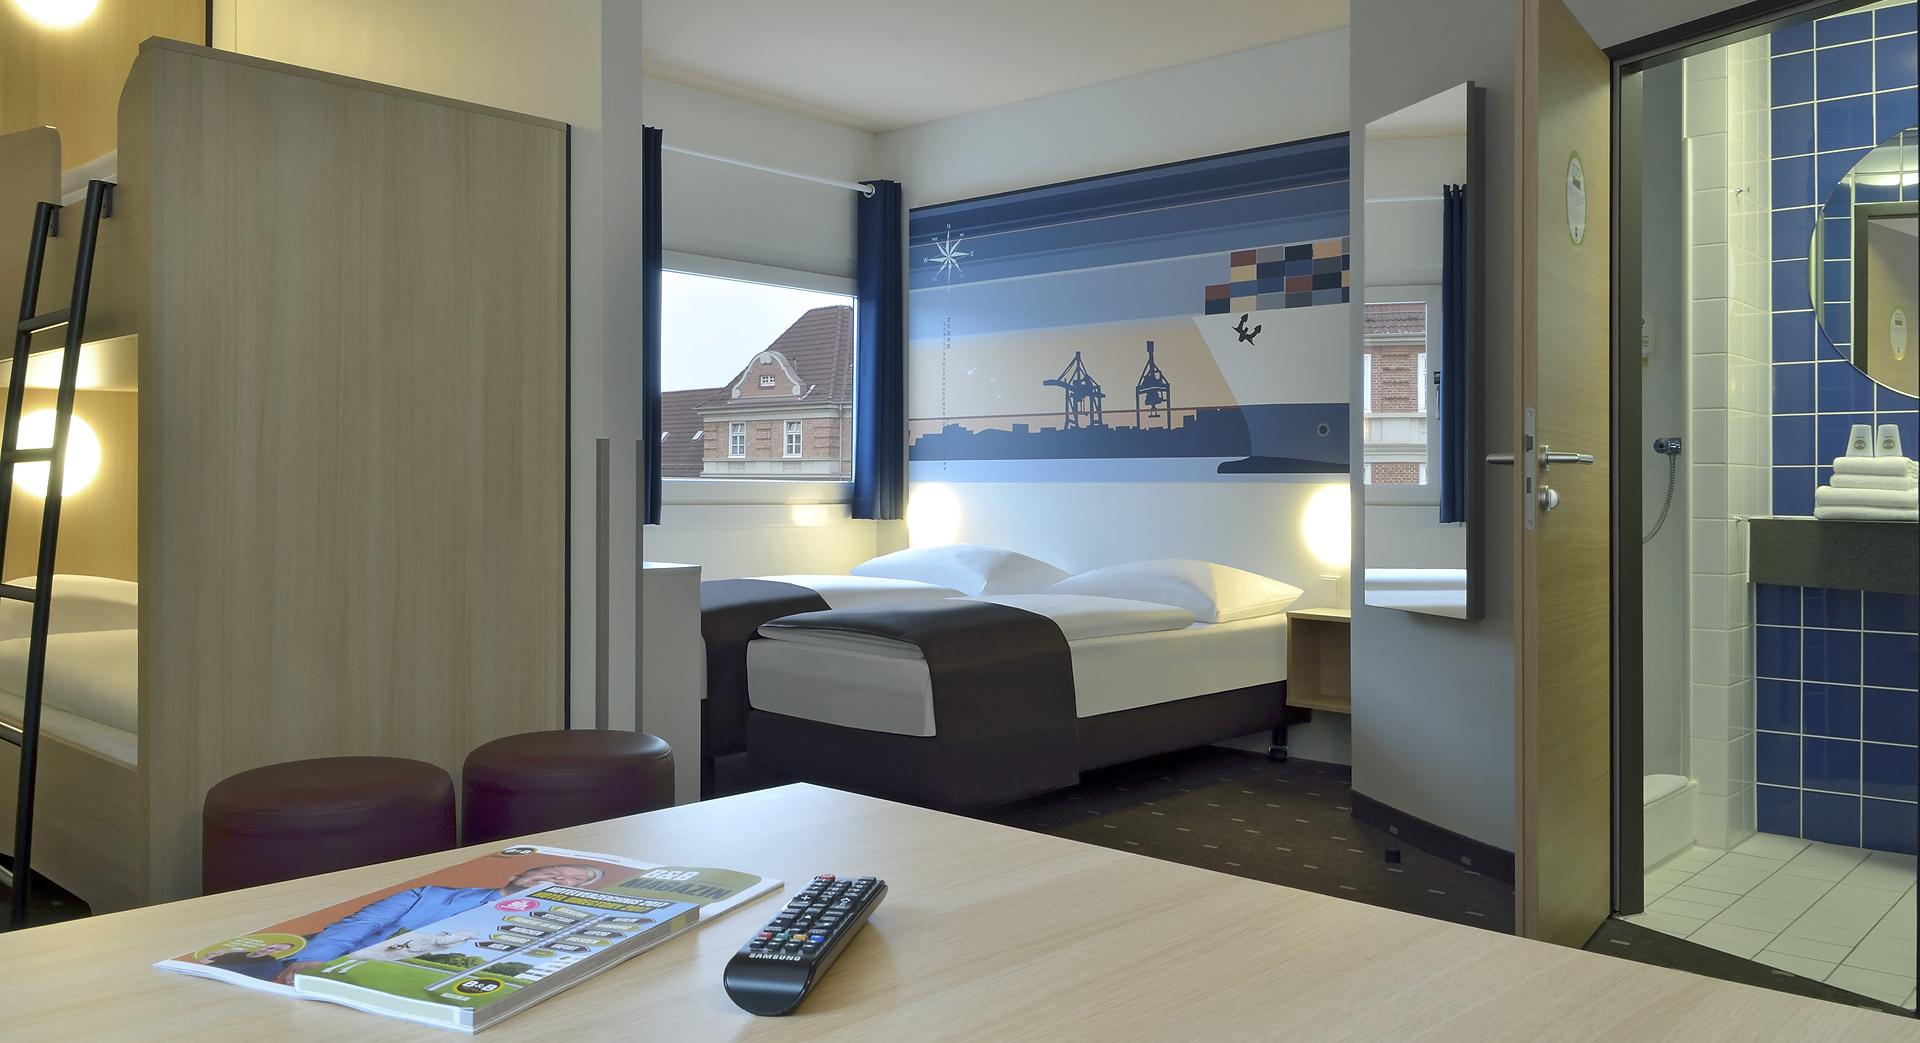 B B Hotel Hamburg Altona Pernoctaciones Baratas En Hamburgo